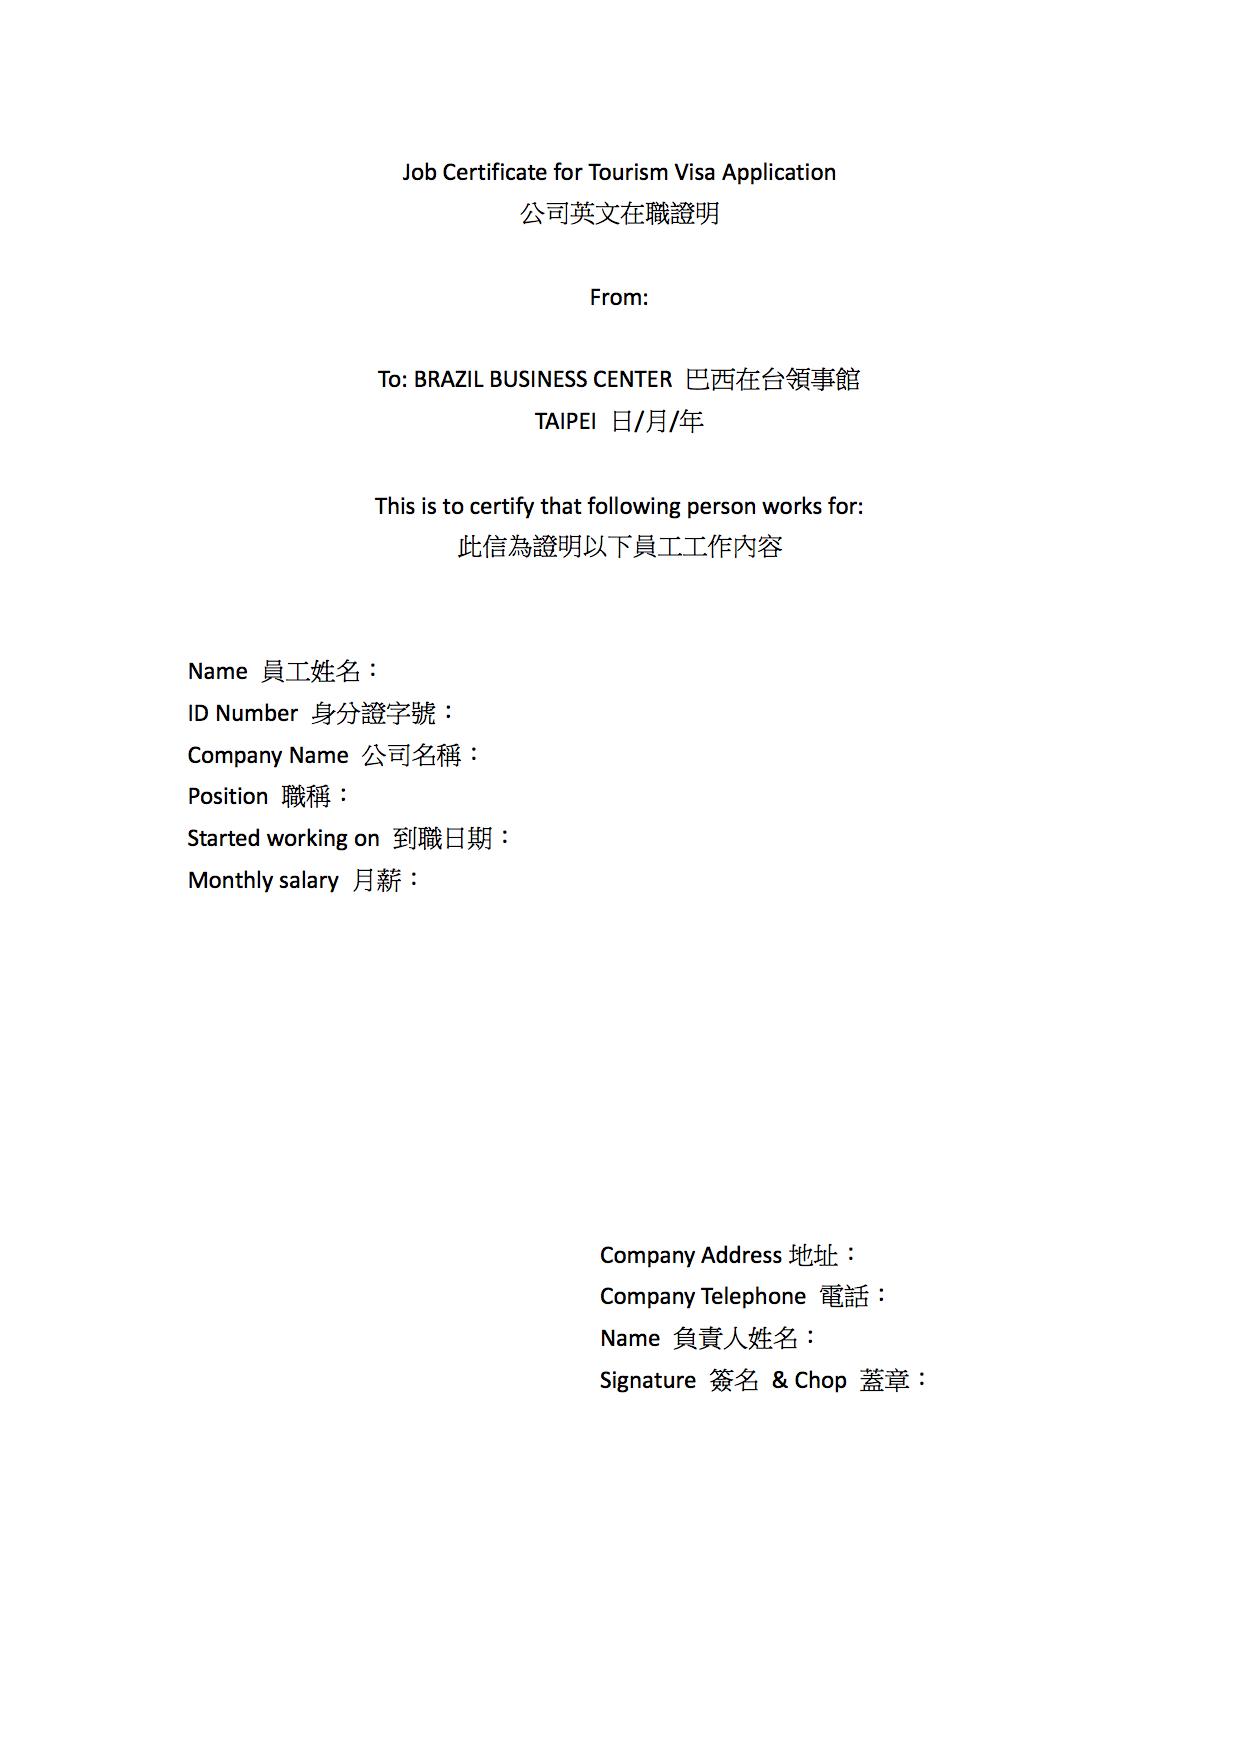 在職 證明 書 英文 版